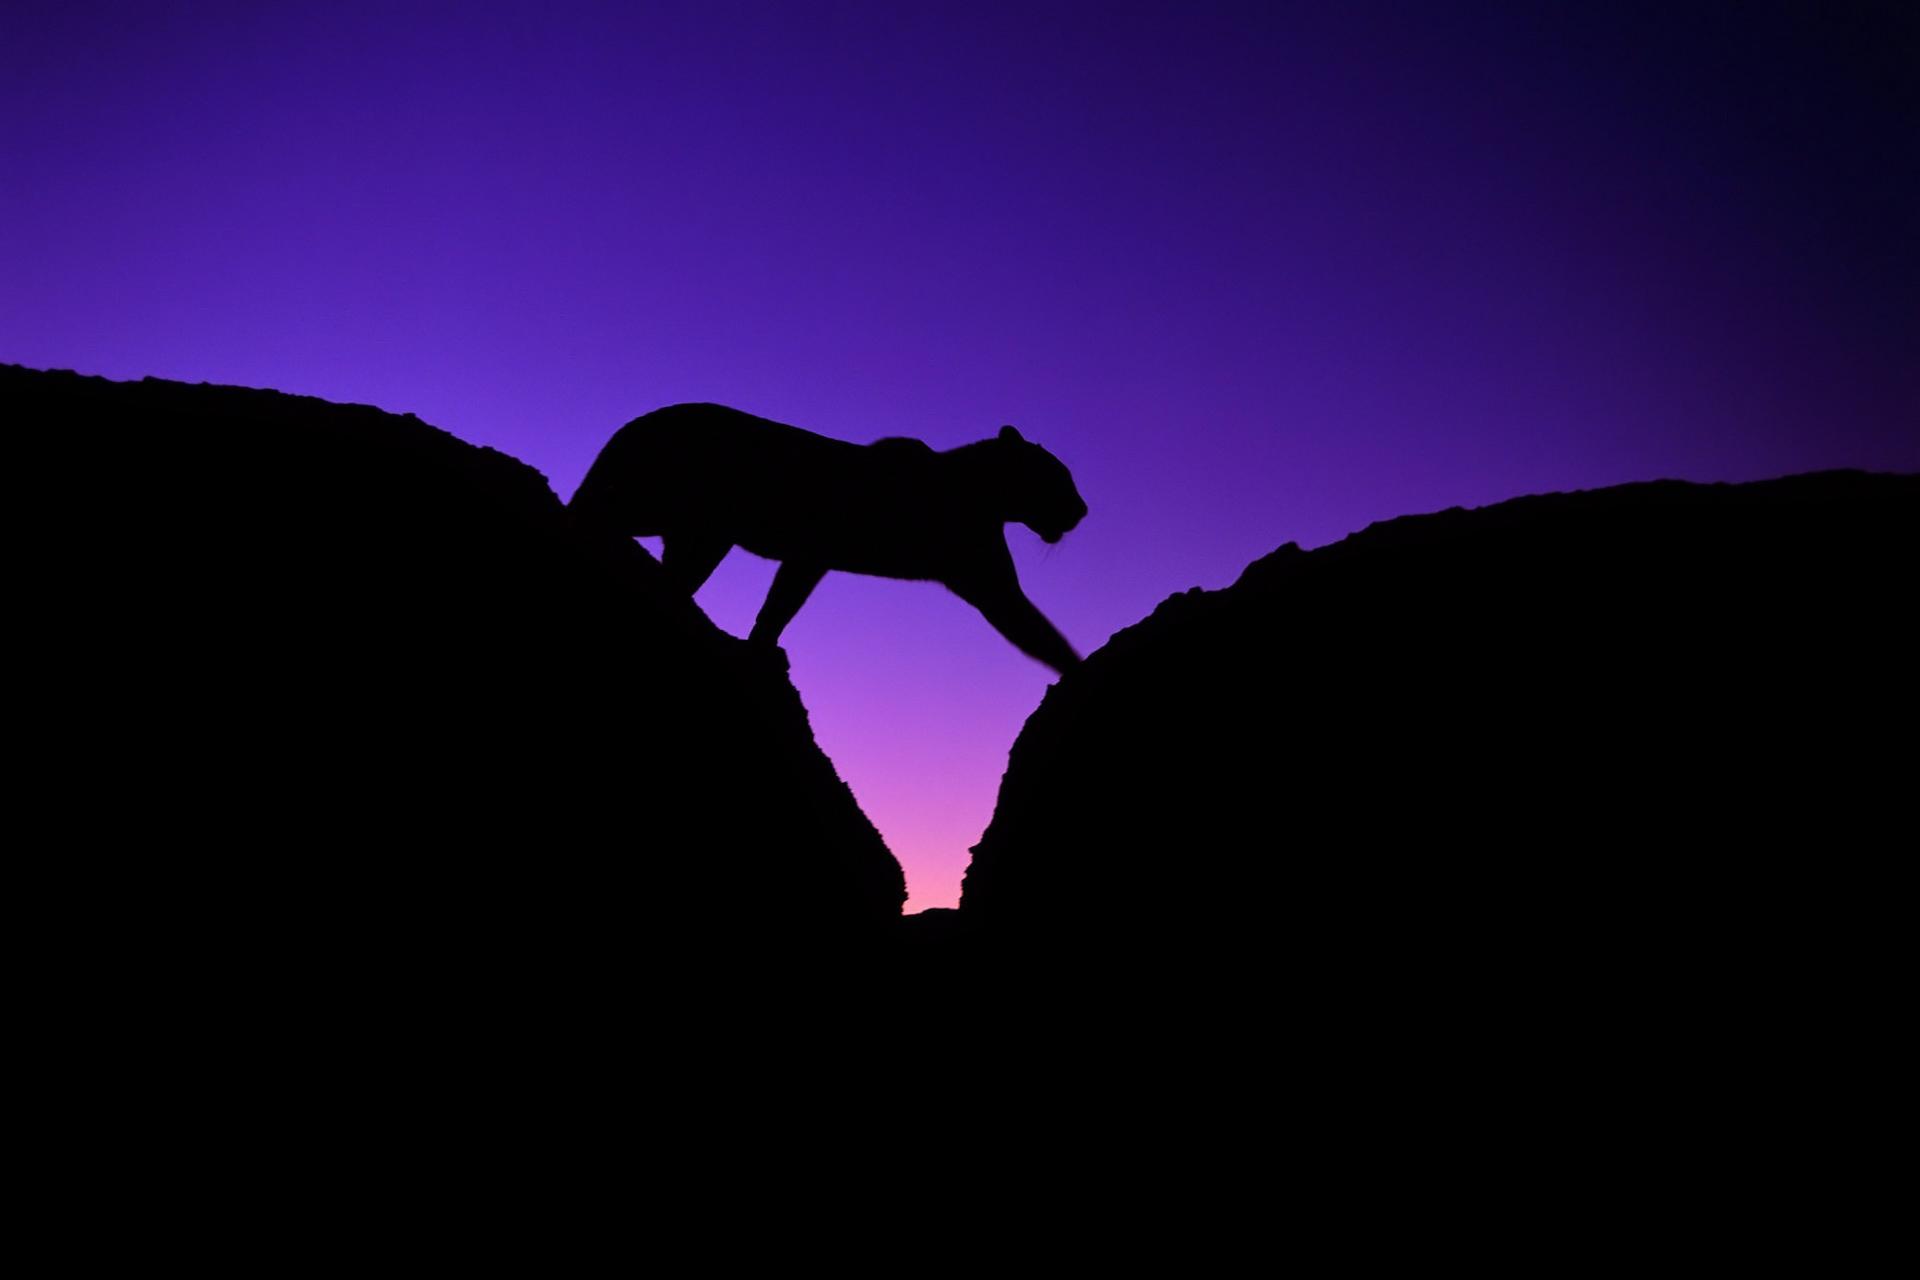 silhouette wallpaper evening